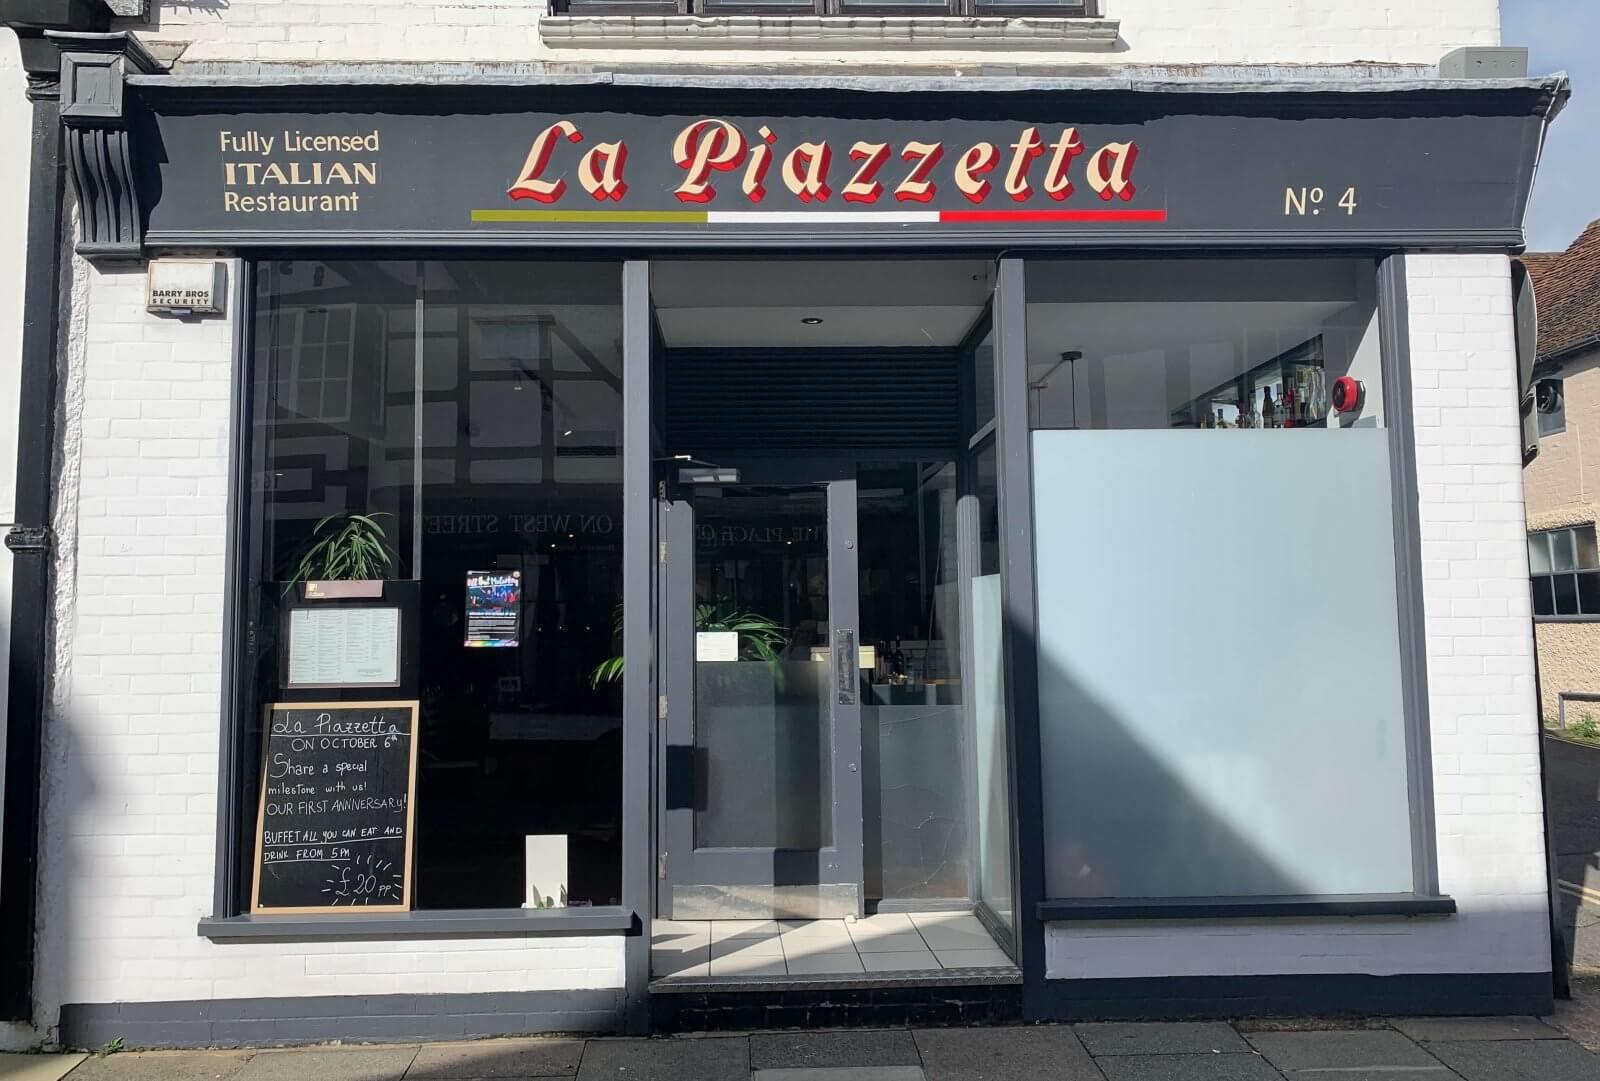 La Piazzetta | The Mustcard